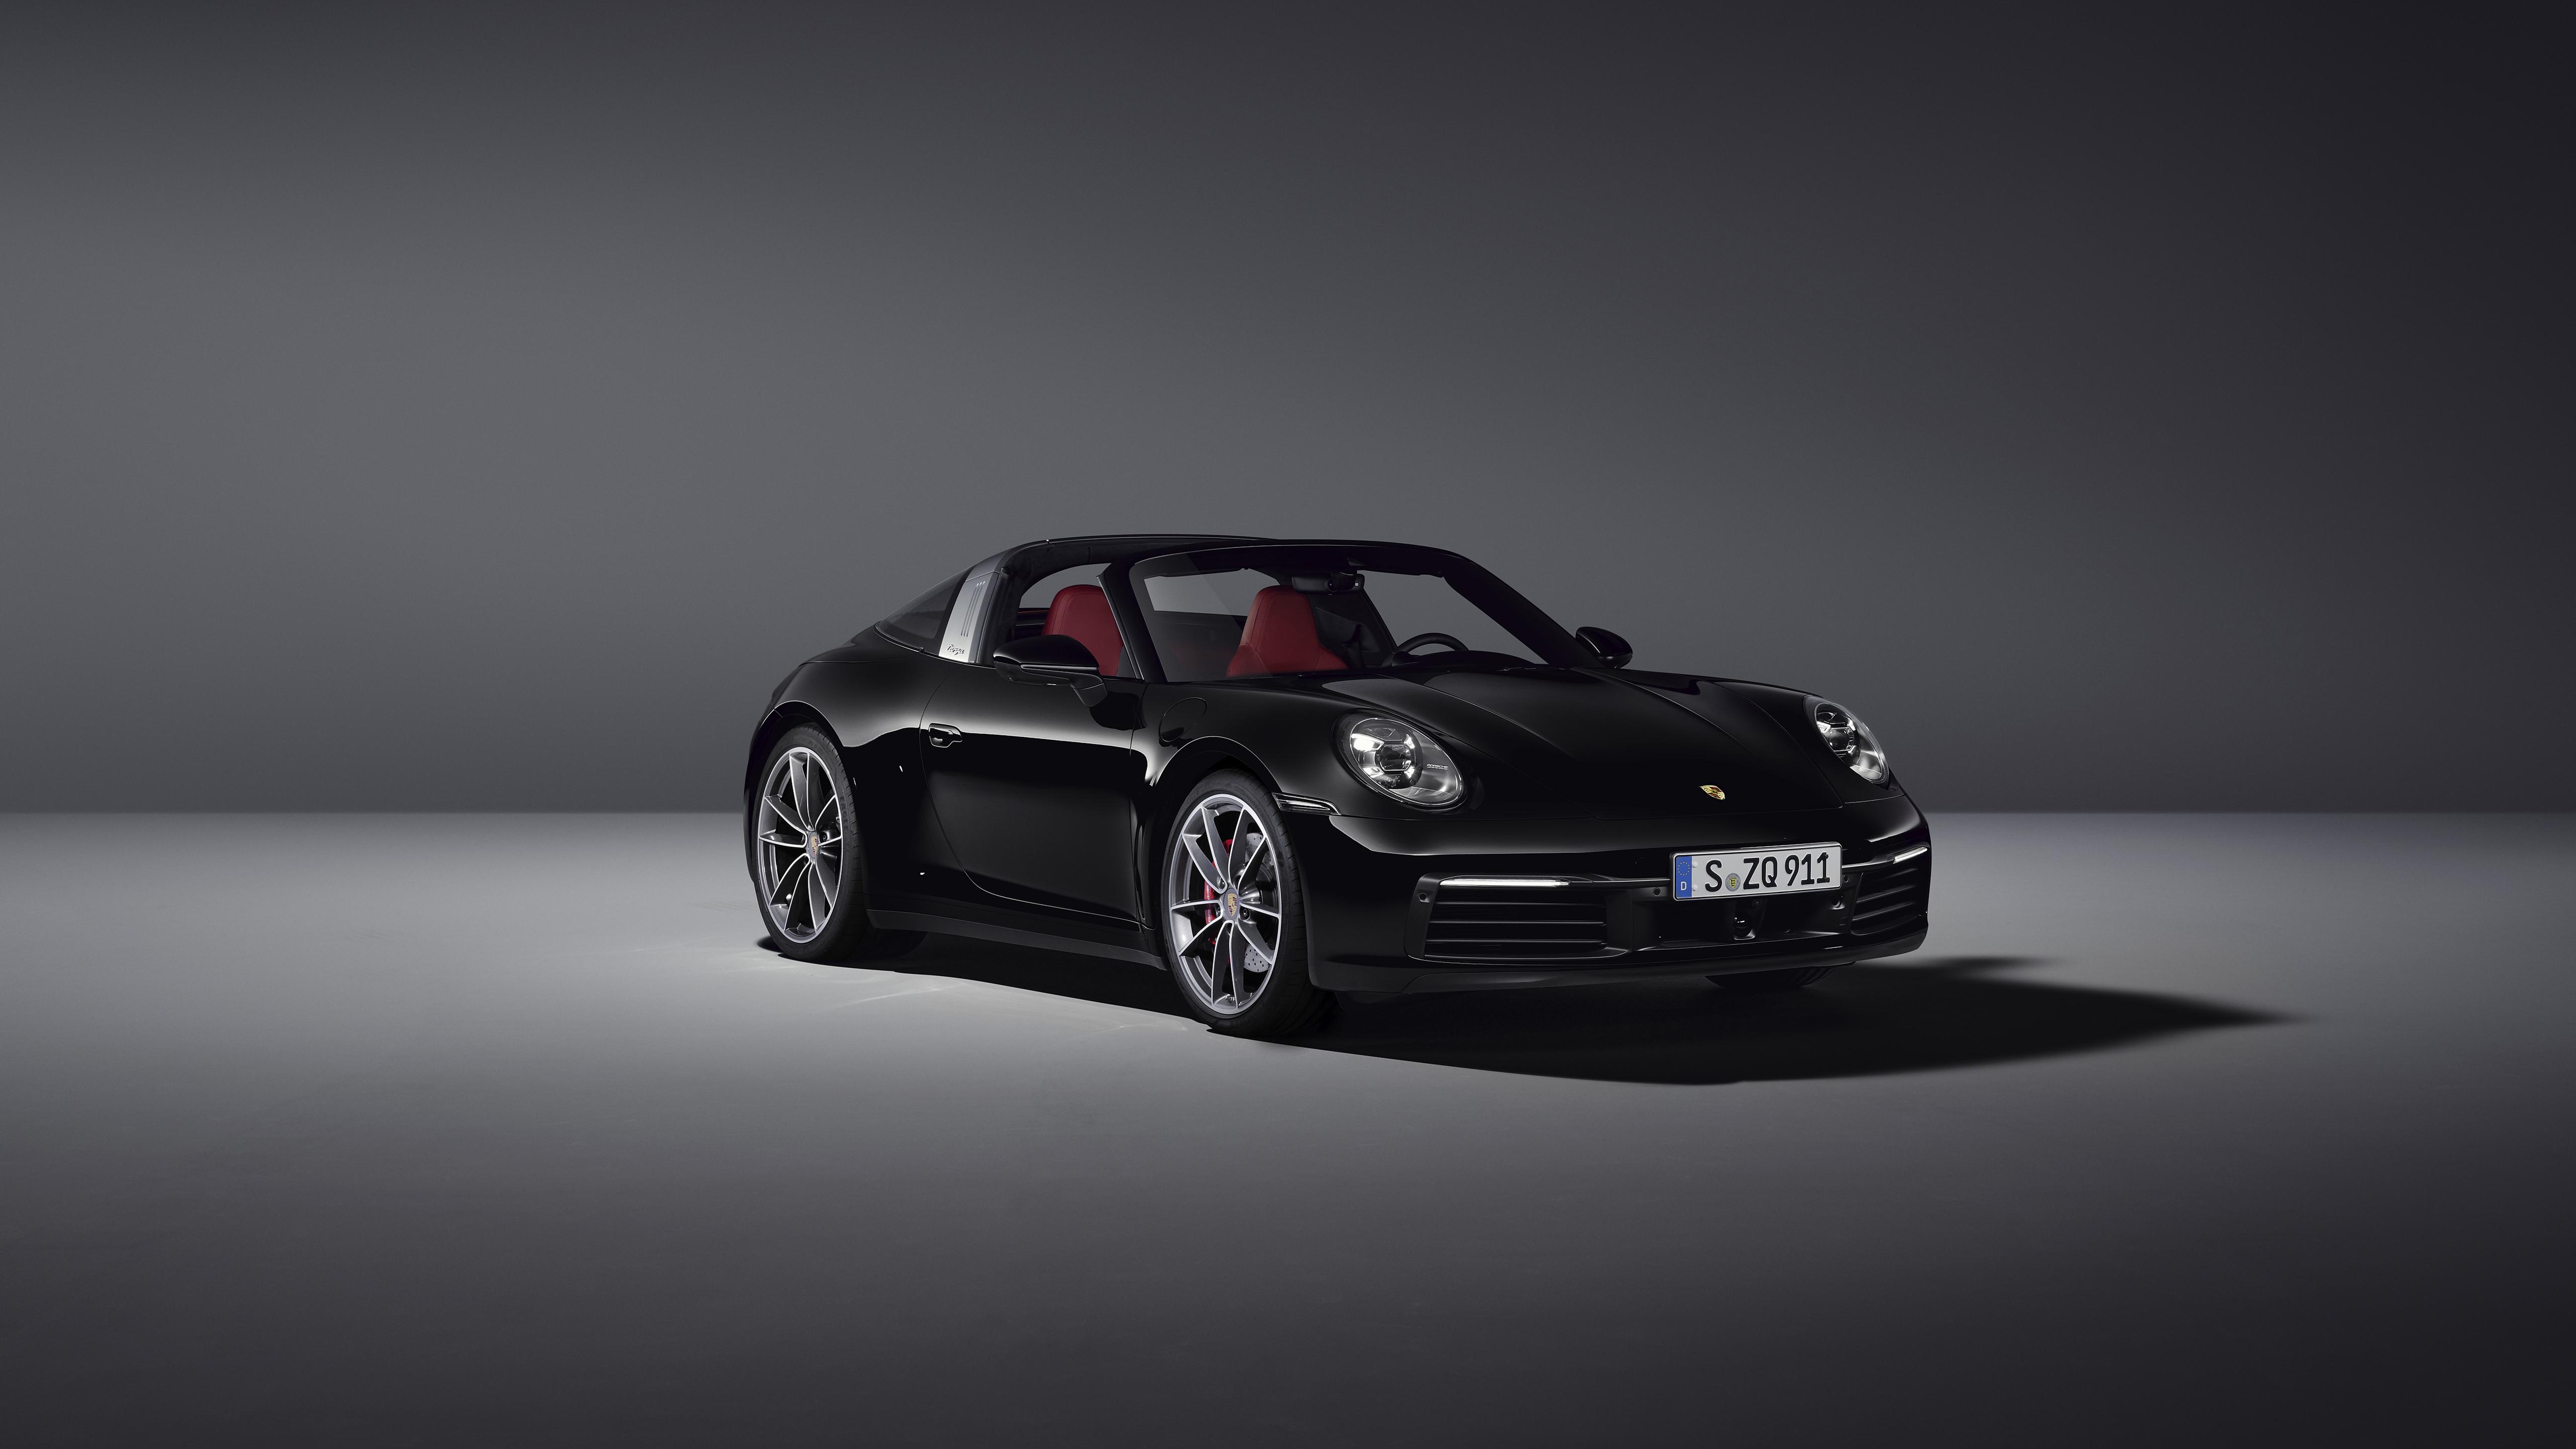 Porsche 911 Targa 4s 2020 5k 3 Wallpaper Hd Car Wallpapers Id 14847